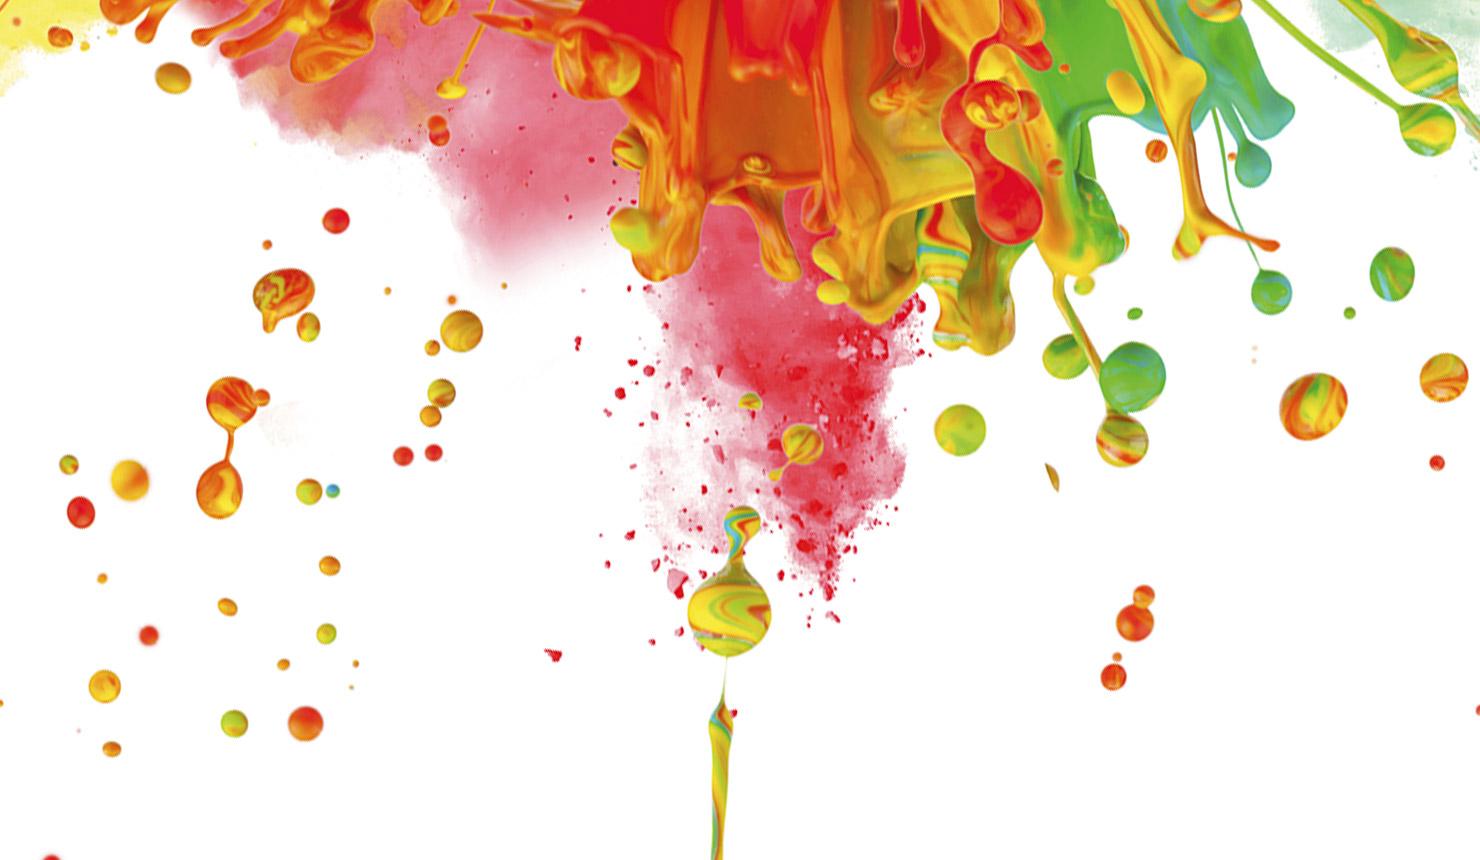 Farbwelten entdecken sie die gro e farbvielfalt arbonia - Immagini passover a colori ...